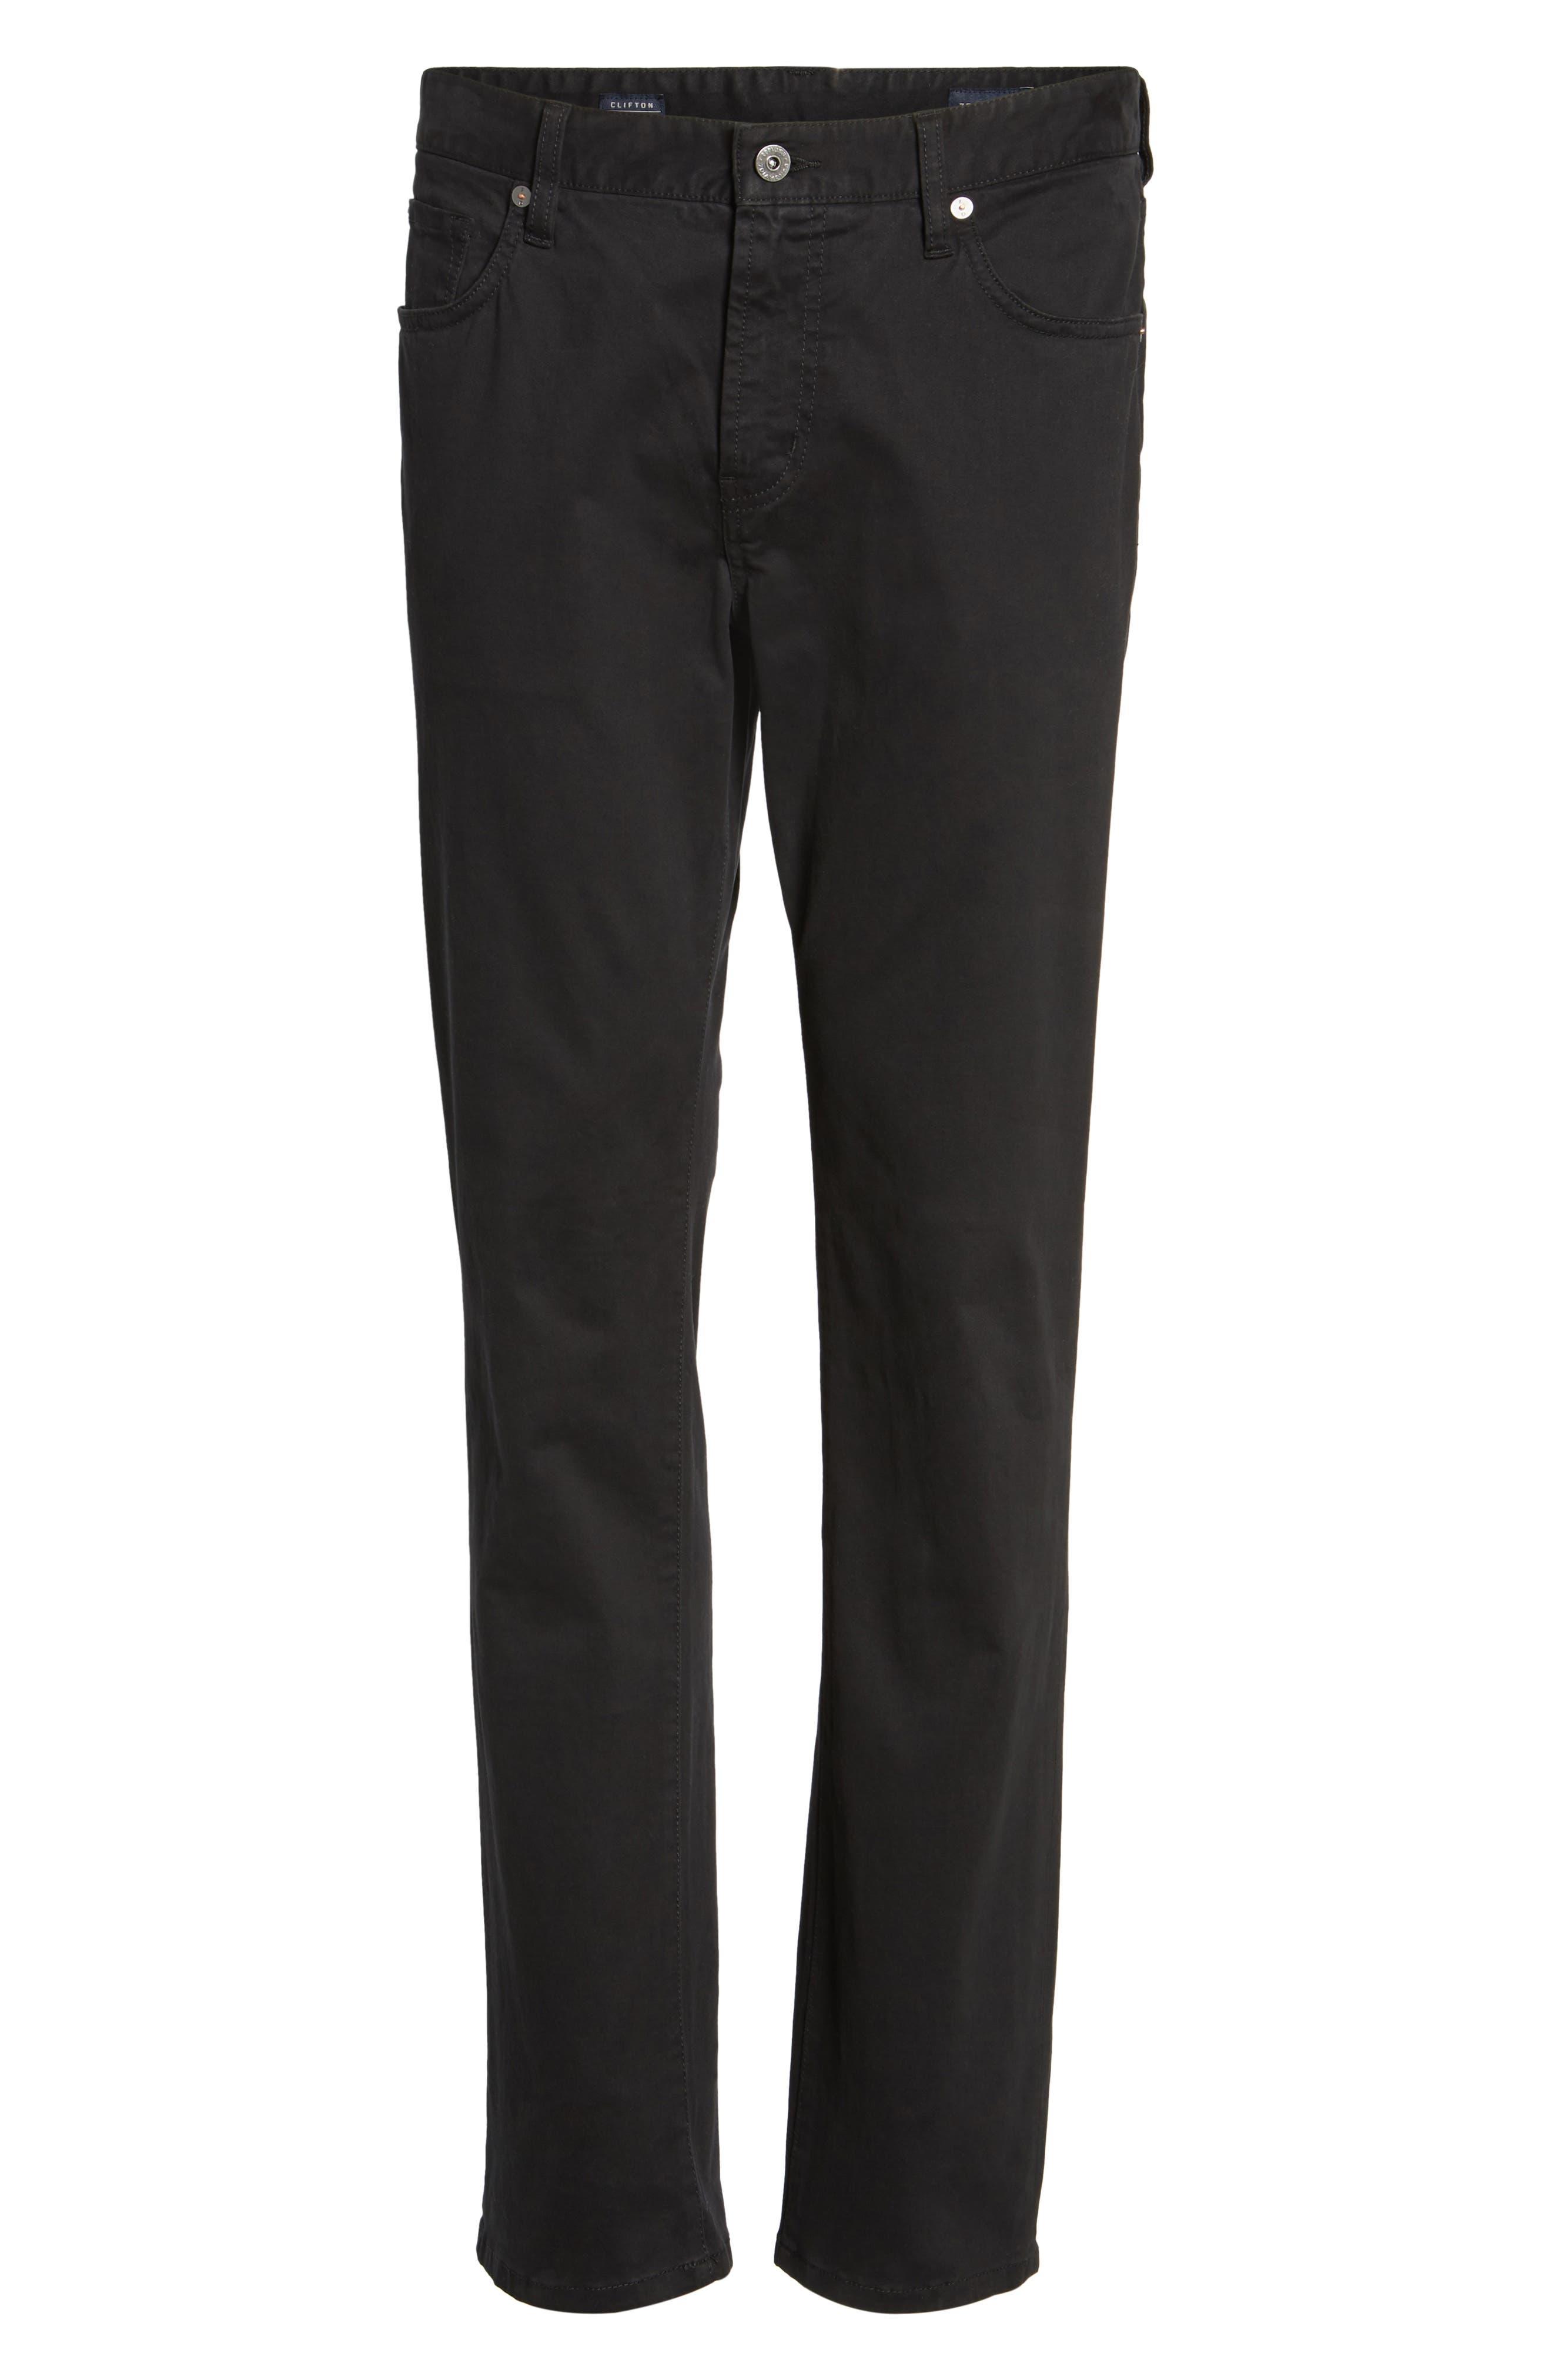 Brushed Twill Five-Pocket Pants,                             Alternate thumbnail 6, color,                             BLACK